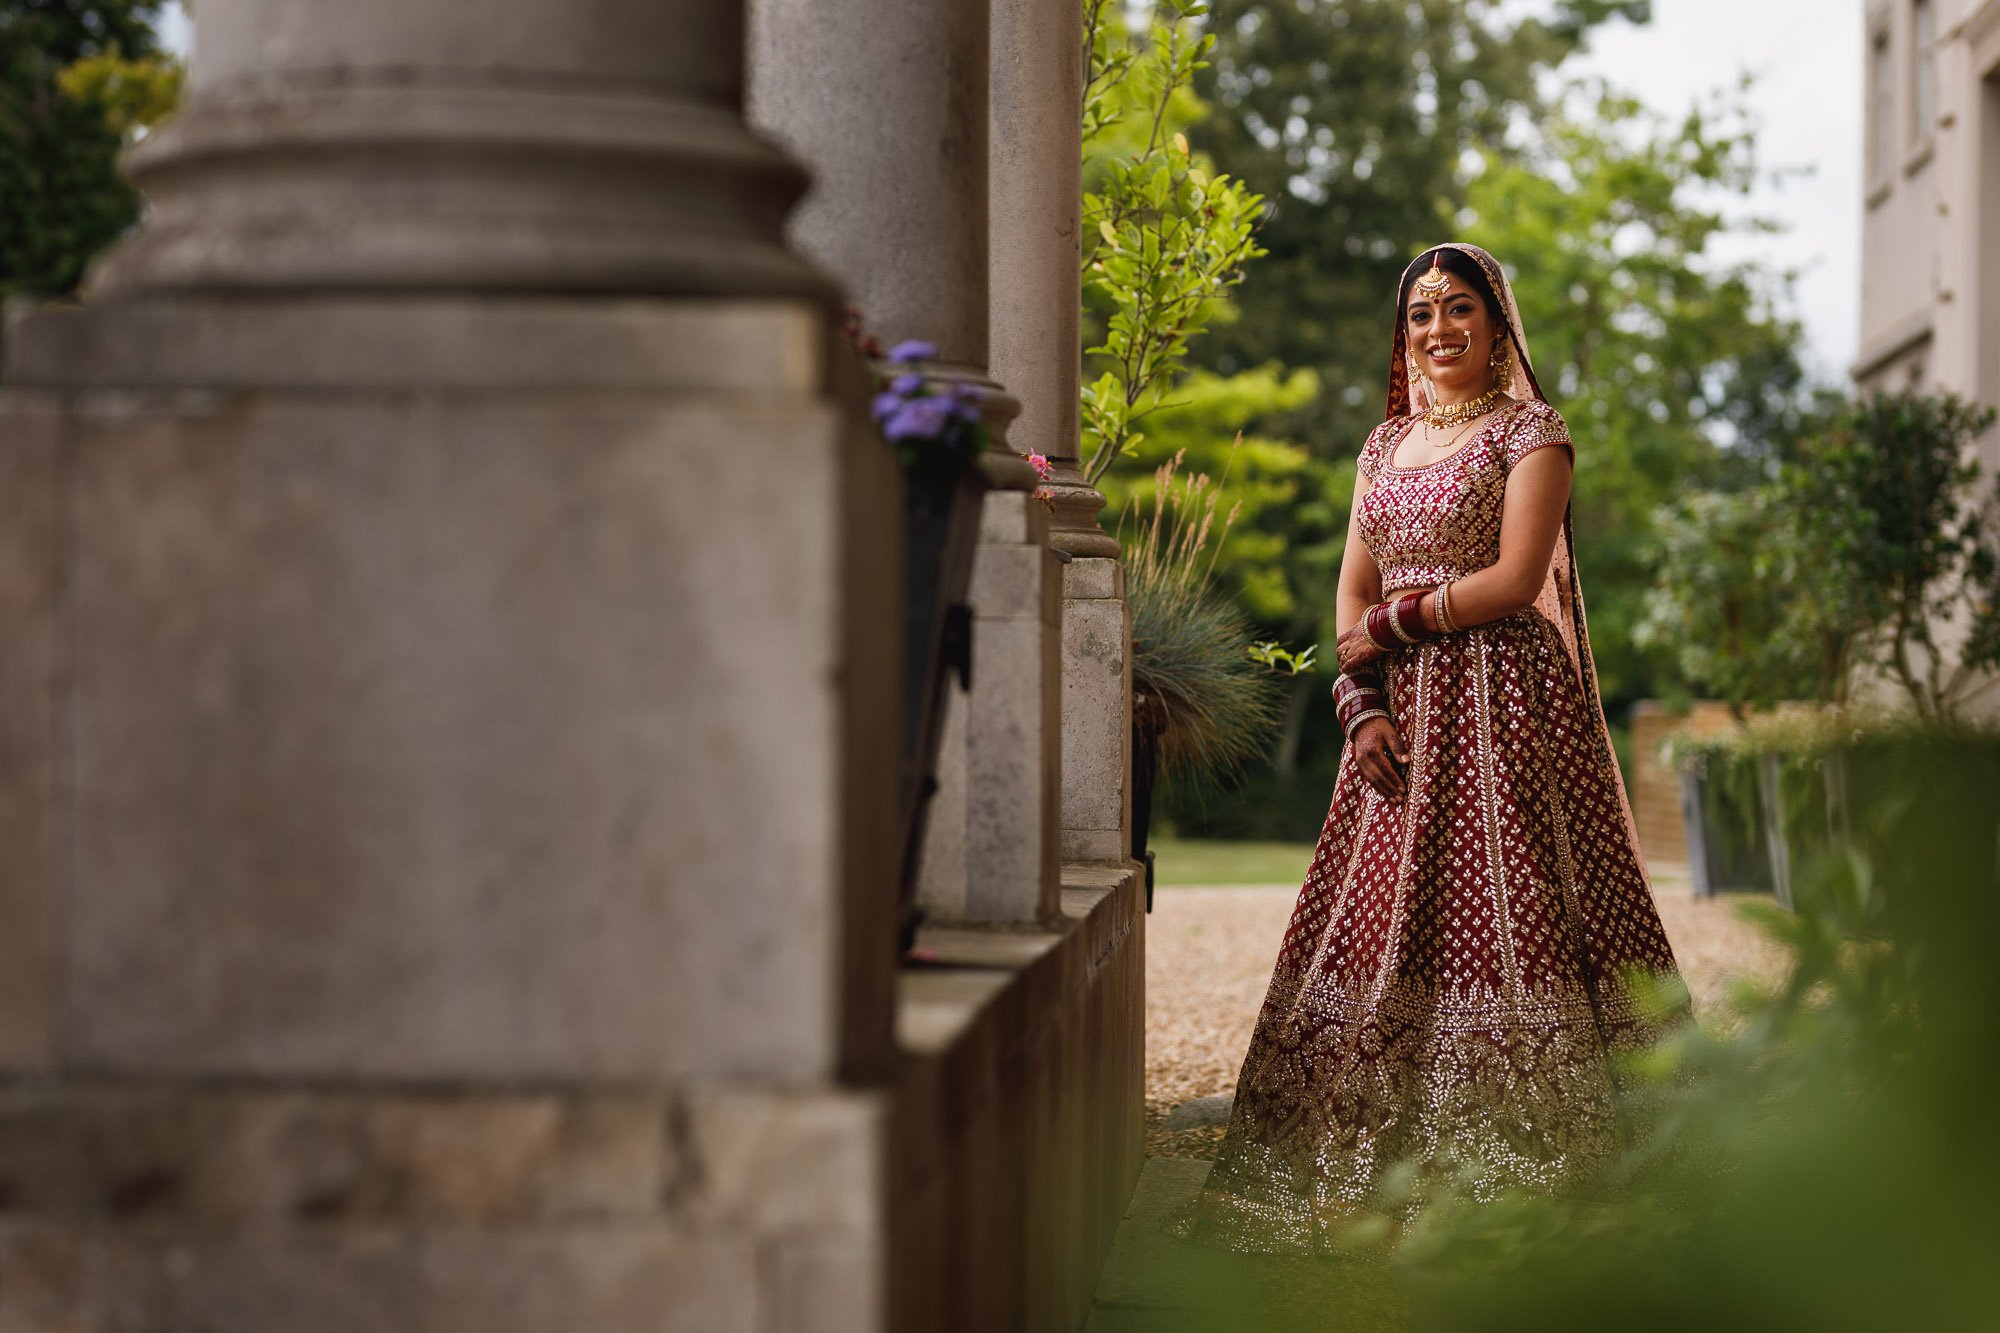 De Vere Wokefield Estate, Asian wedding photographer, bride portrait